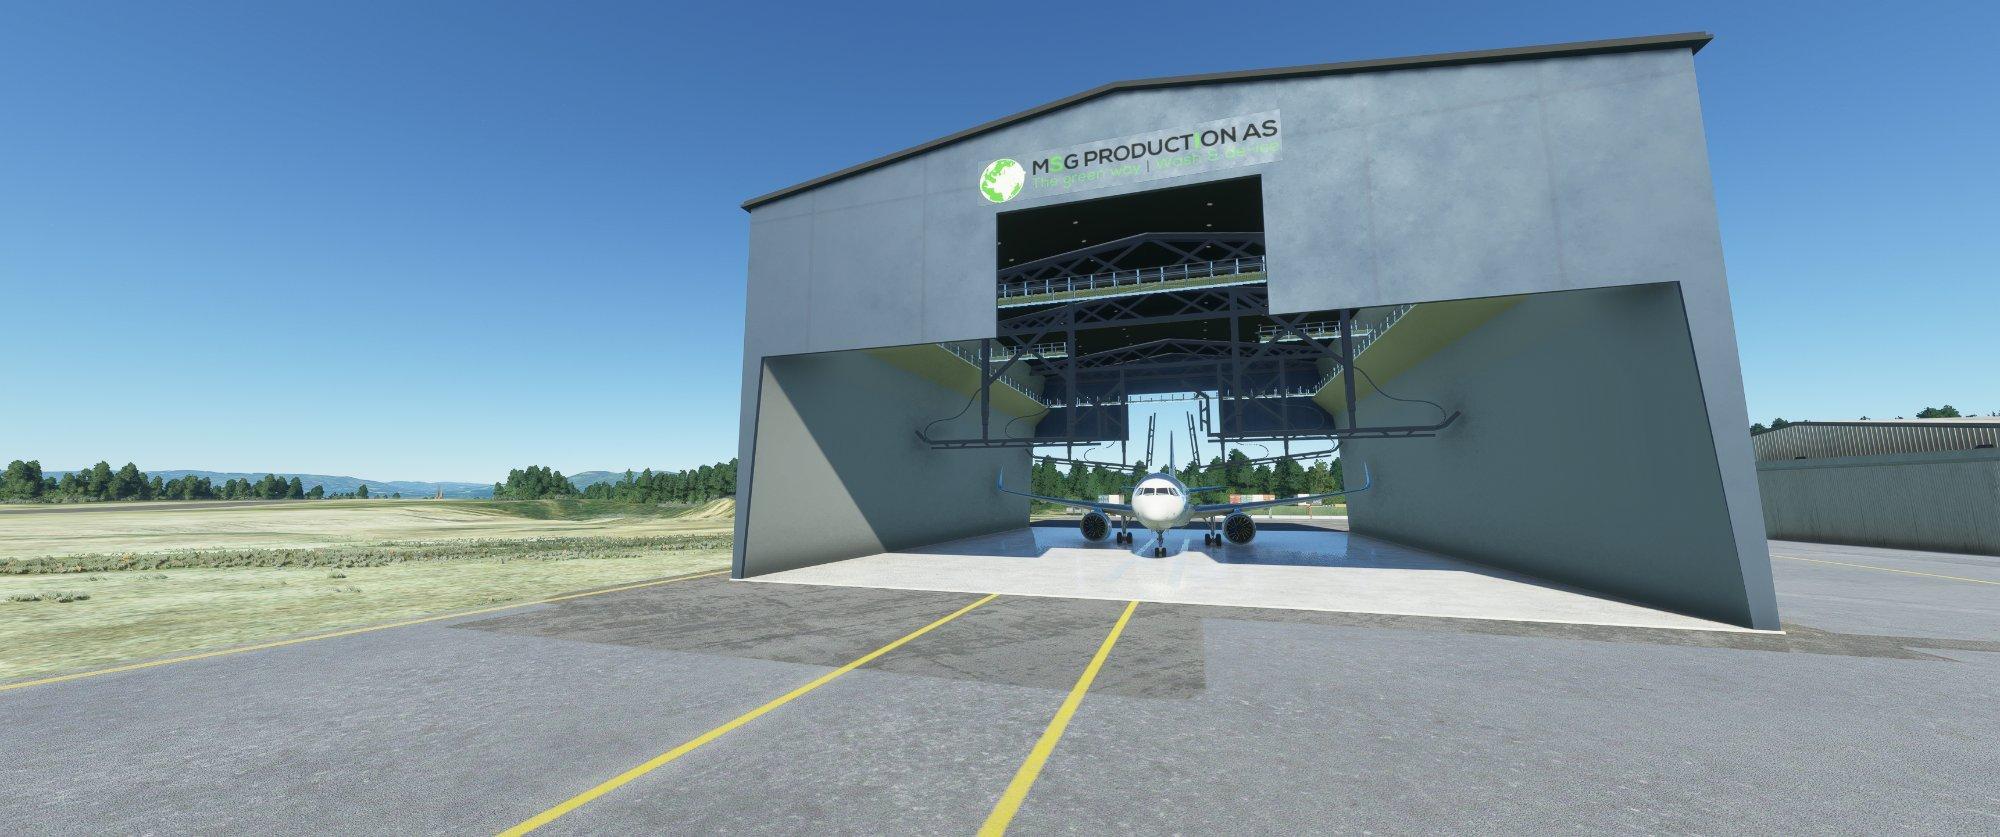 Microsoft Flight Simulator Screenshot 2021.07.16 - 22.53.32.28.jpg